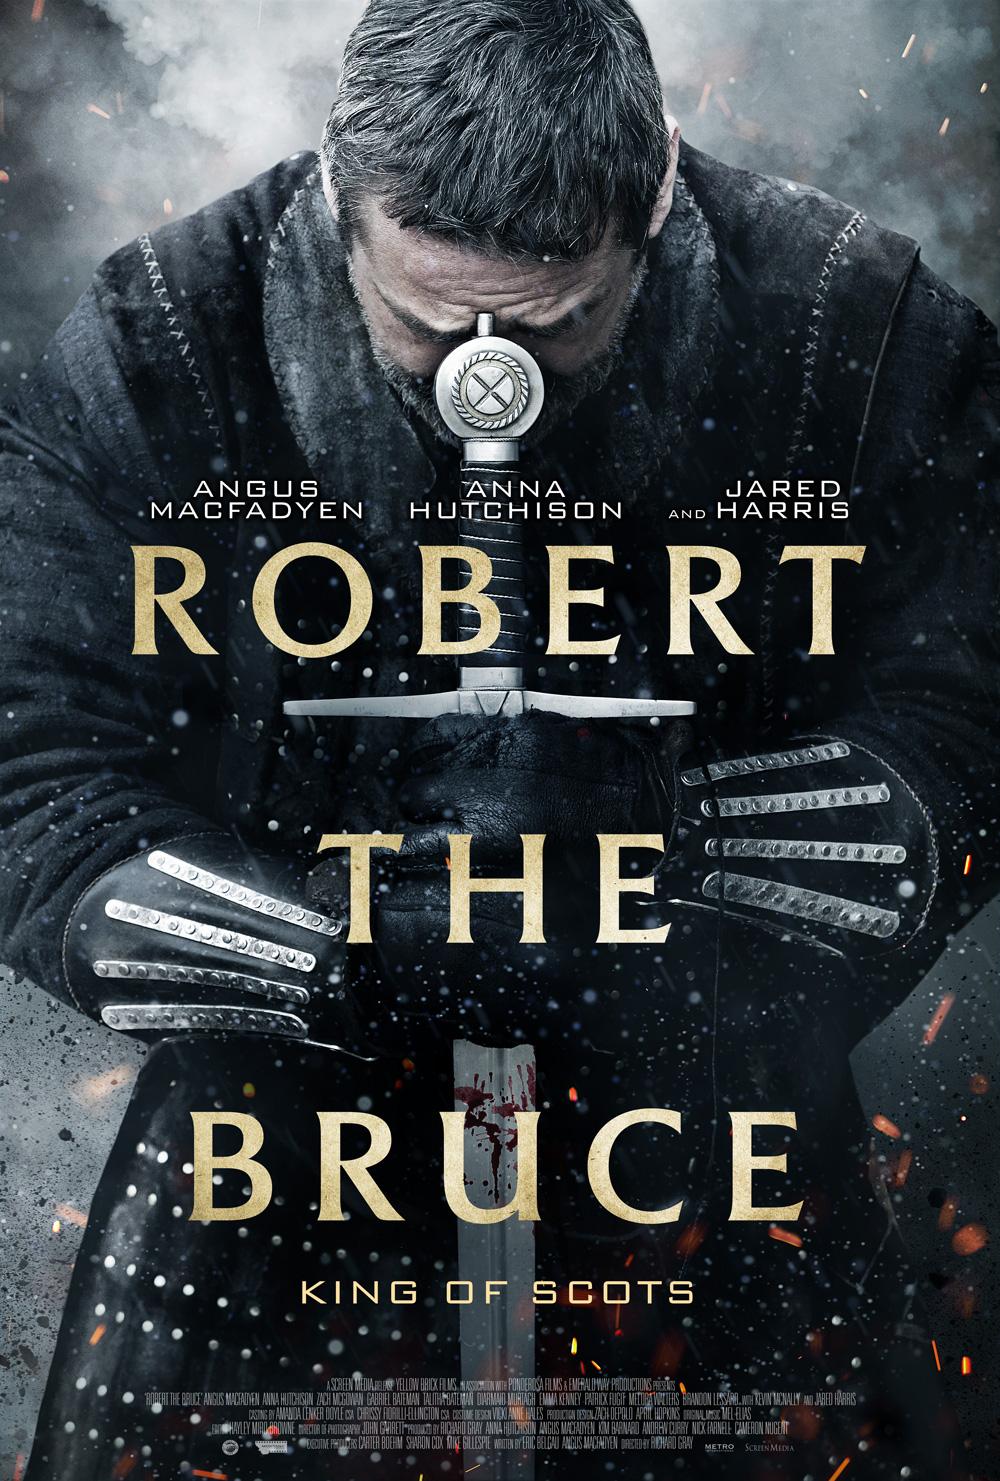 RobertBruce